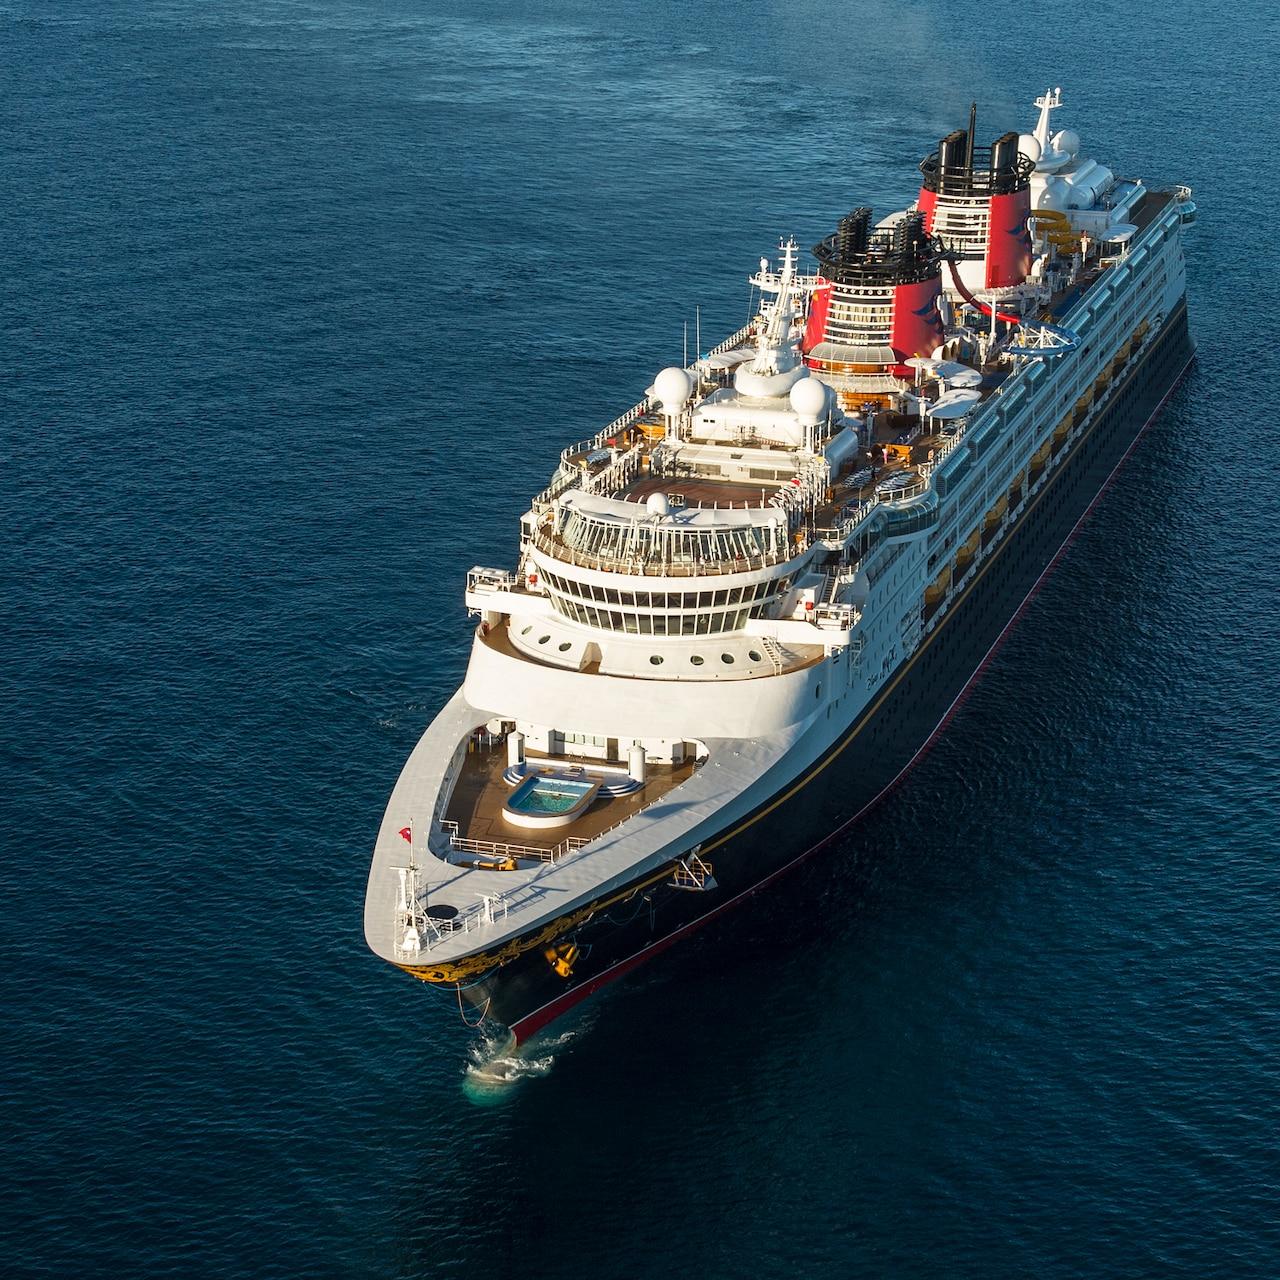 An aerial view of the Disney Magic cruise ship at sea